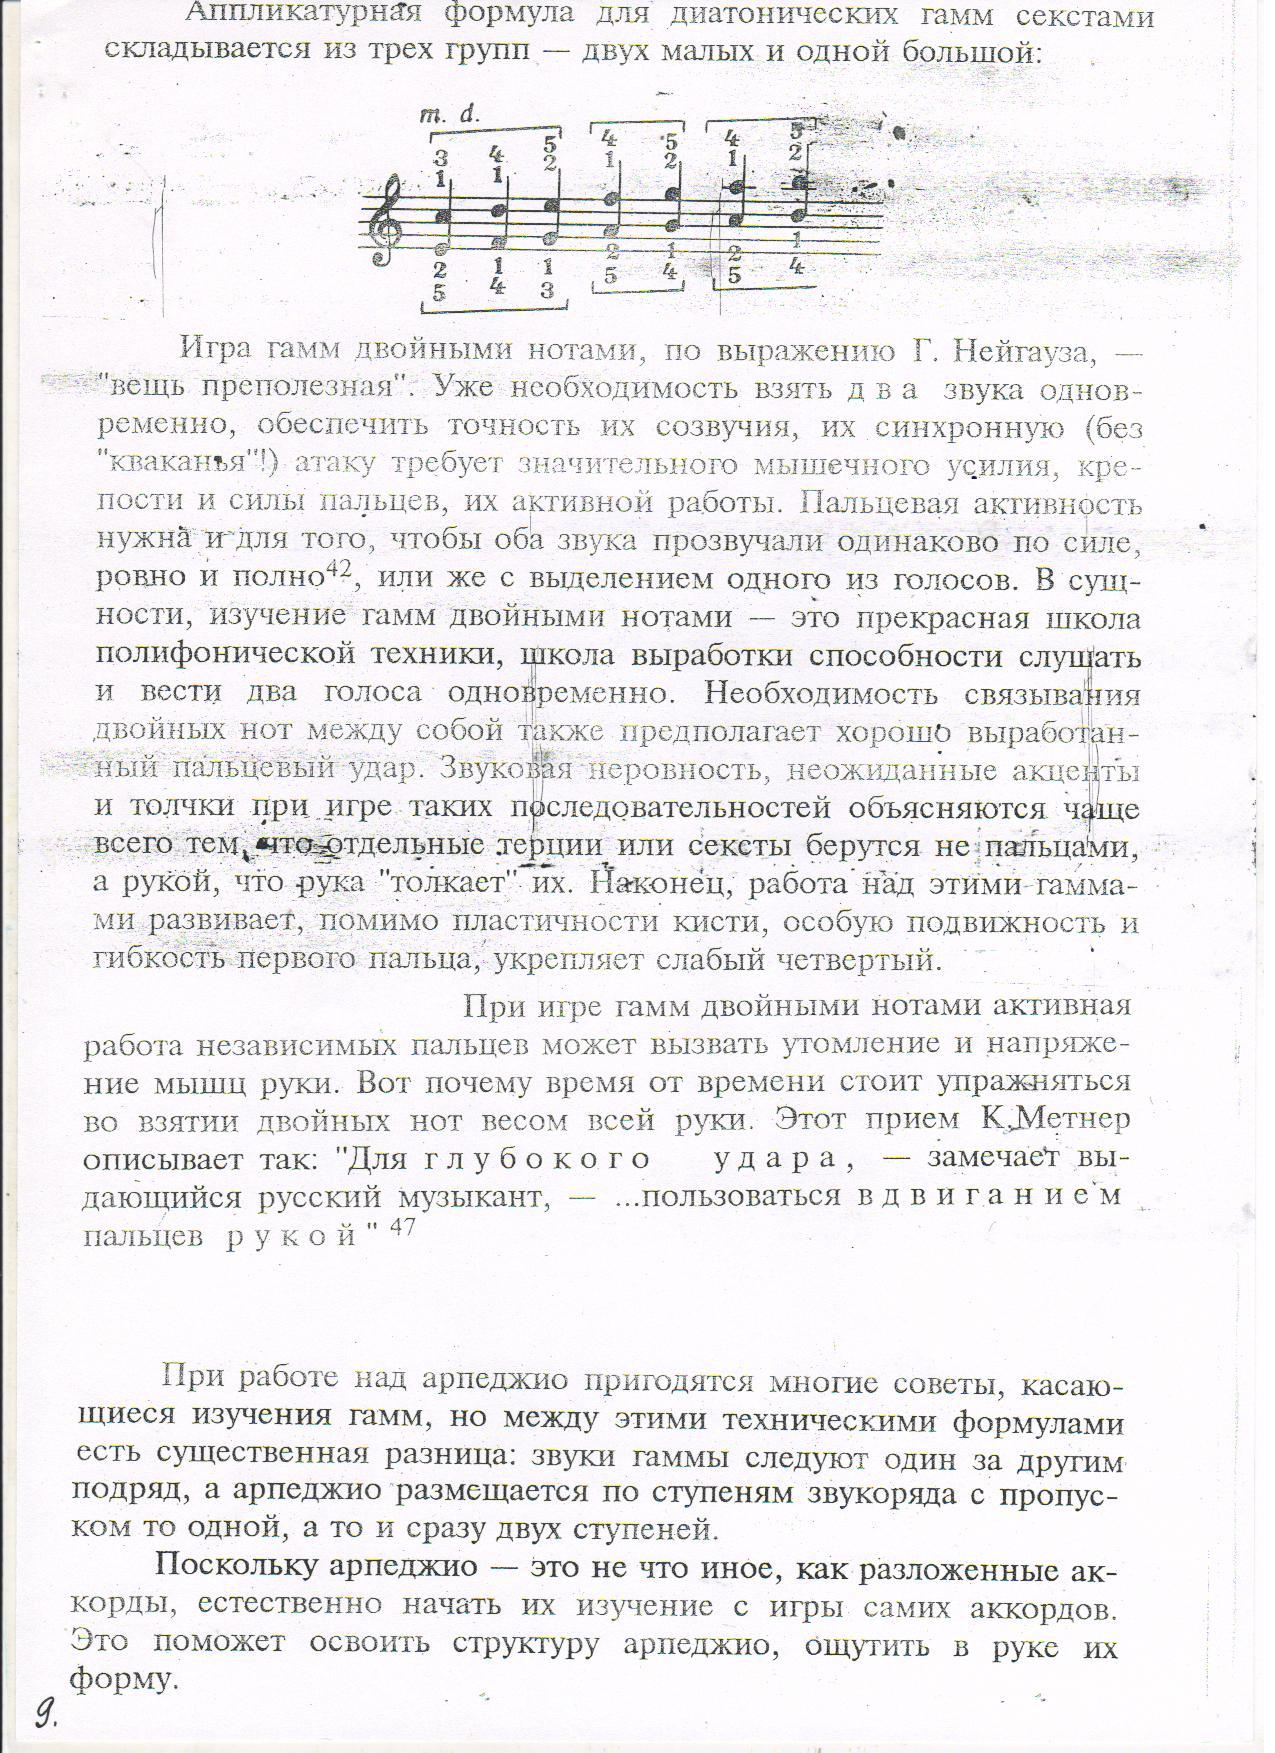 C:\Documents and Settings\Учитель\Рабочий стол\гаммы 11.jpg